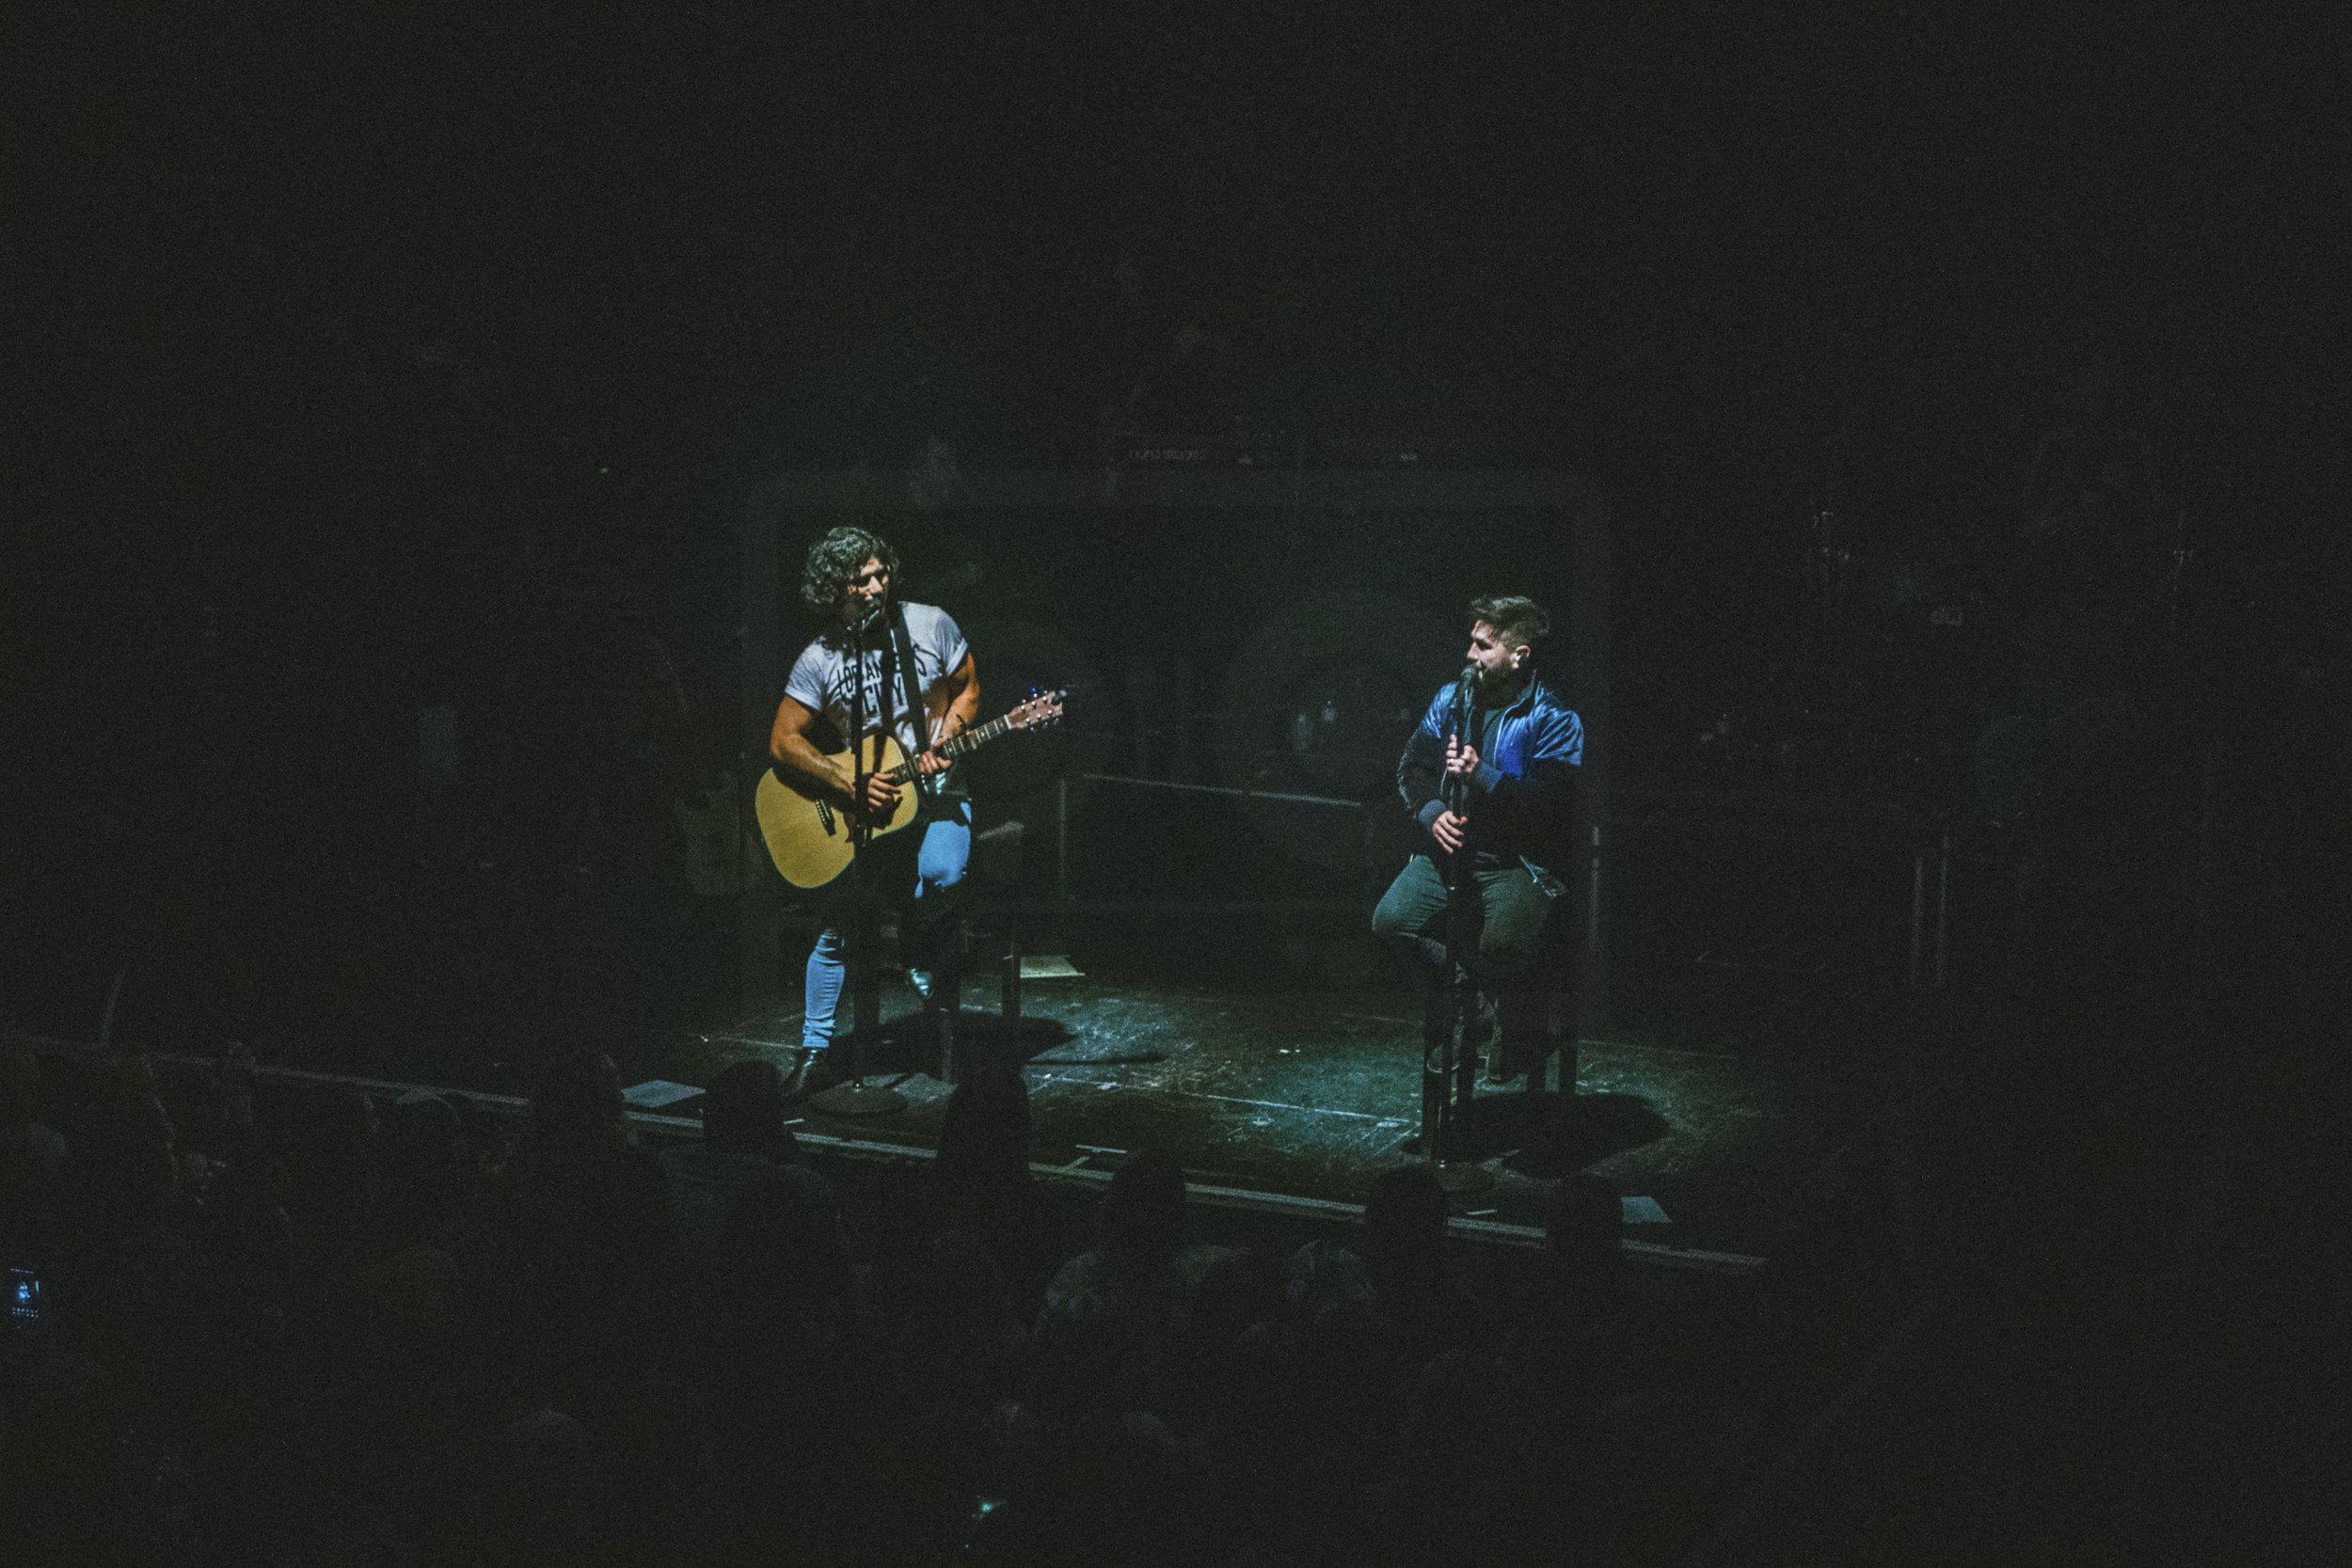 DAN + SHAY // O2 INSTITUTE, BIRMINGHAM — THE MODERN RECORD